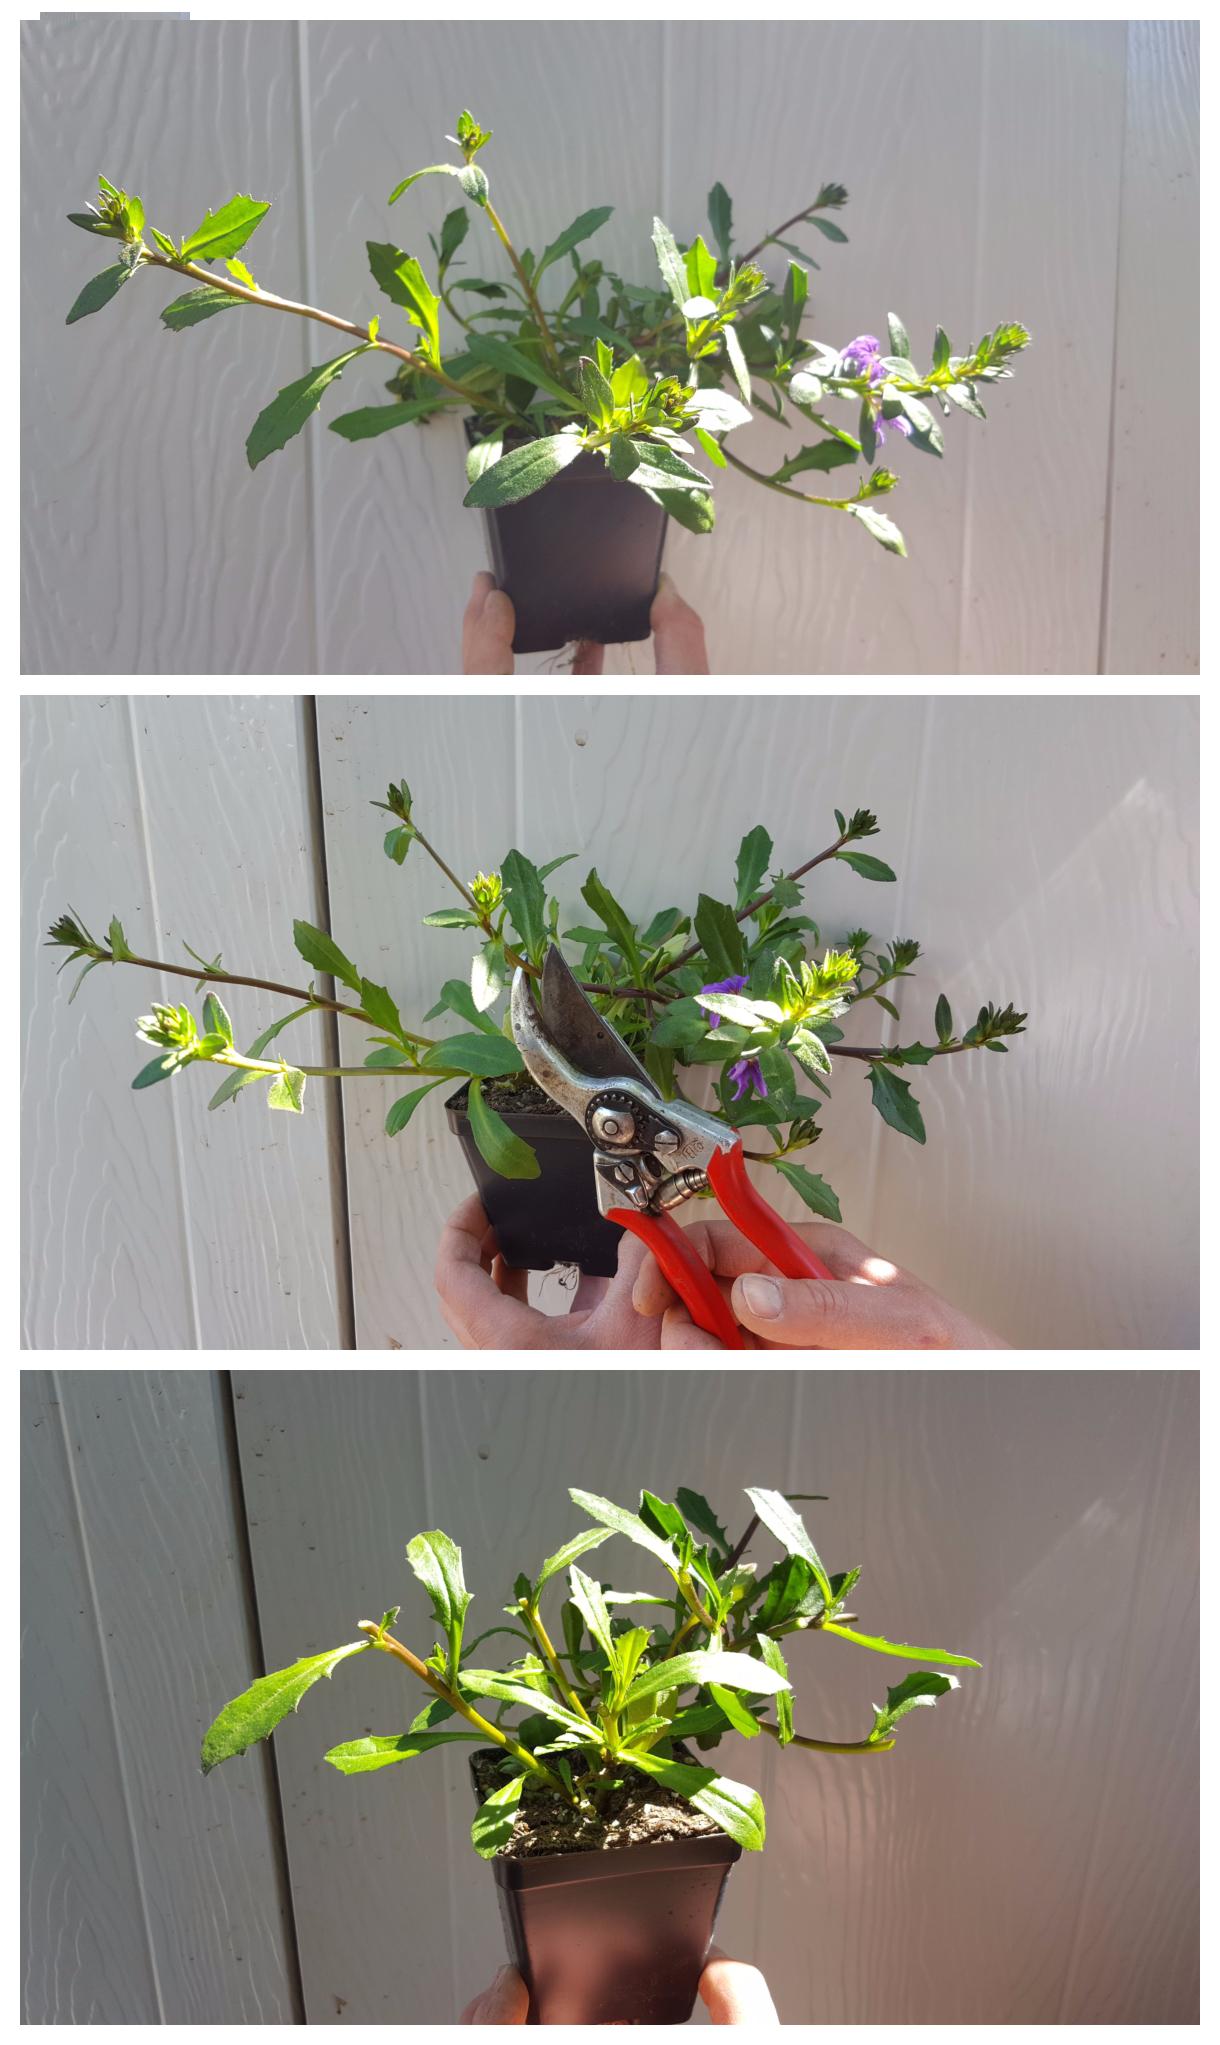 Cutting back scaveola promotes lush new growth.